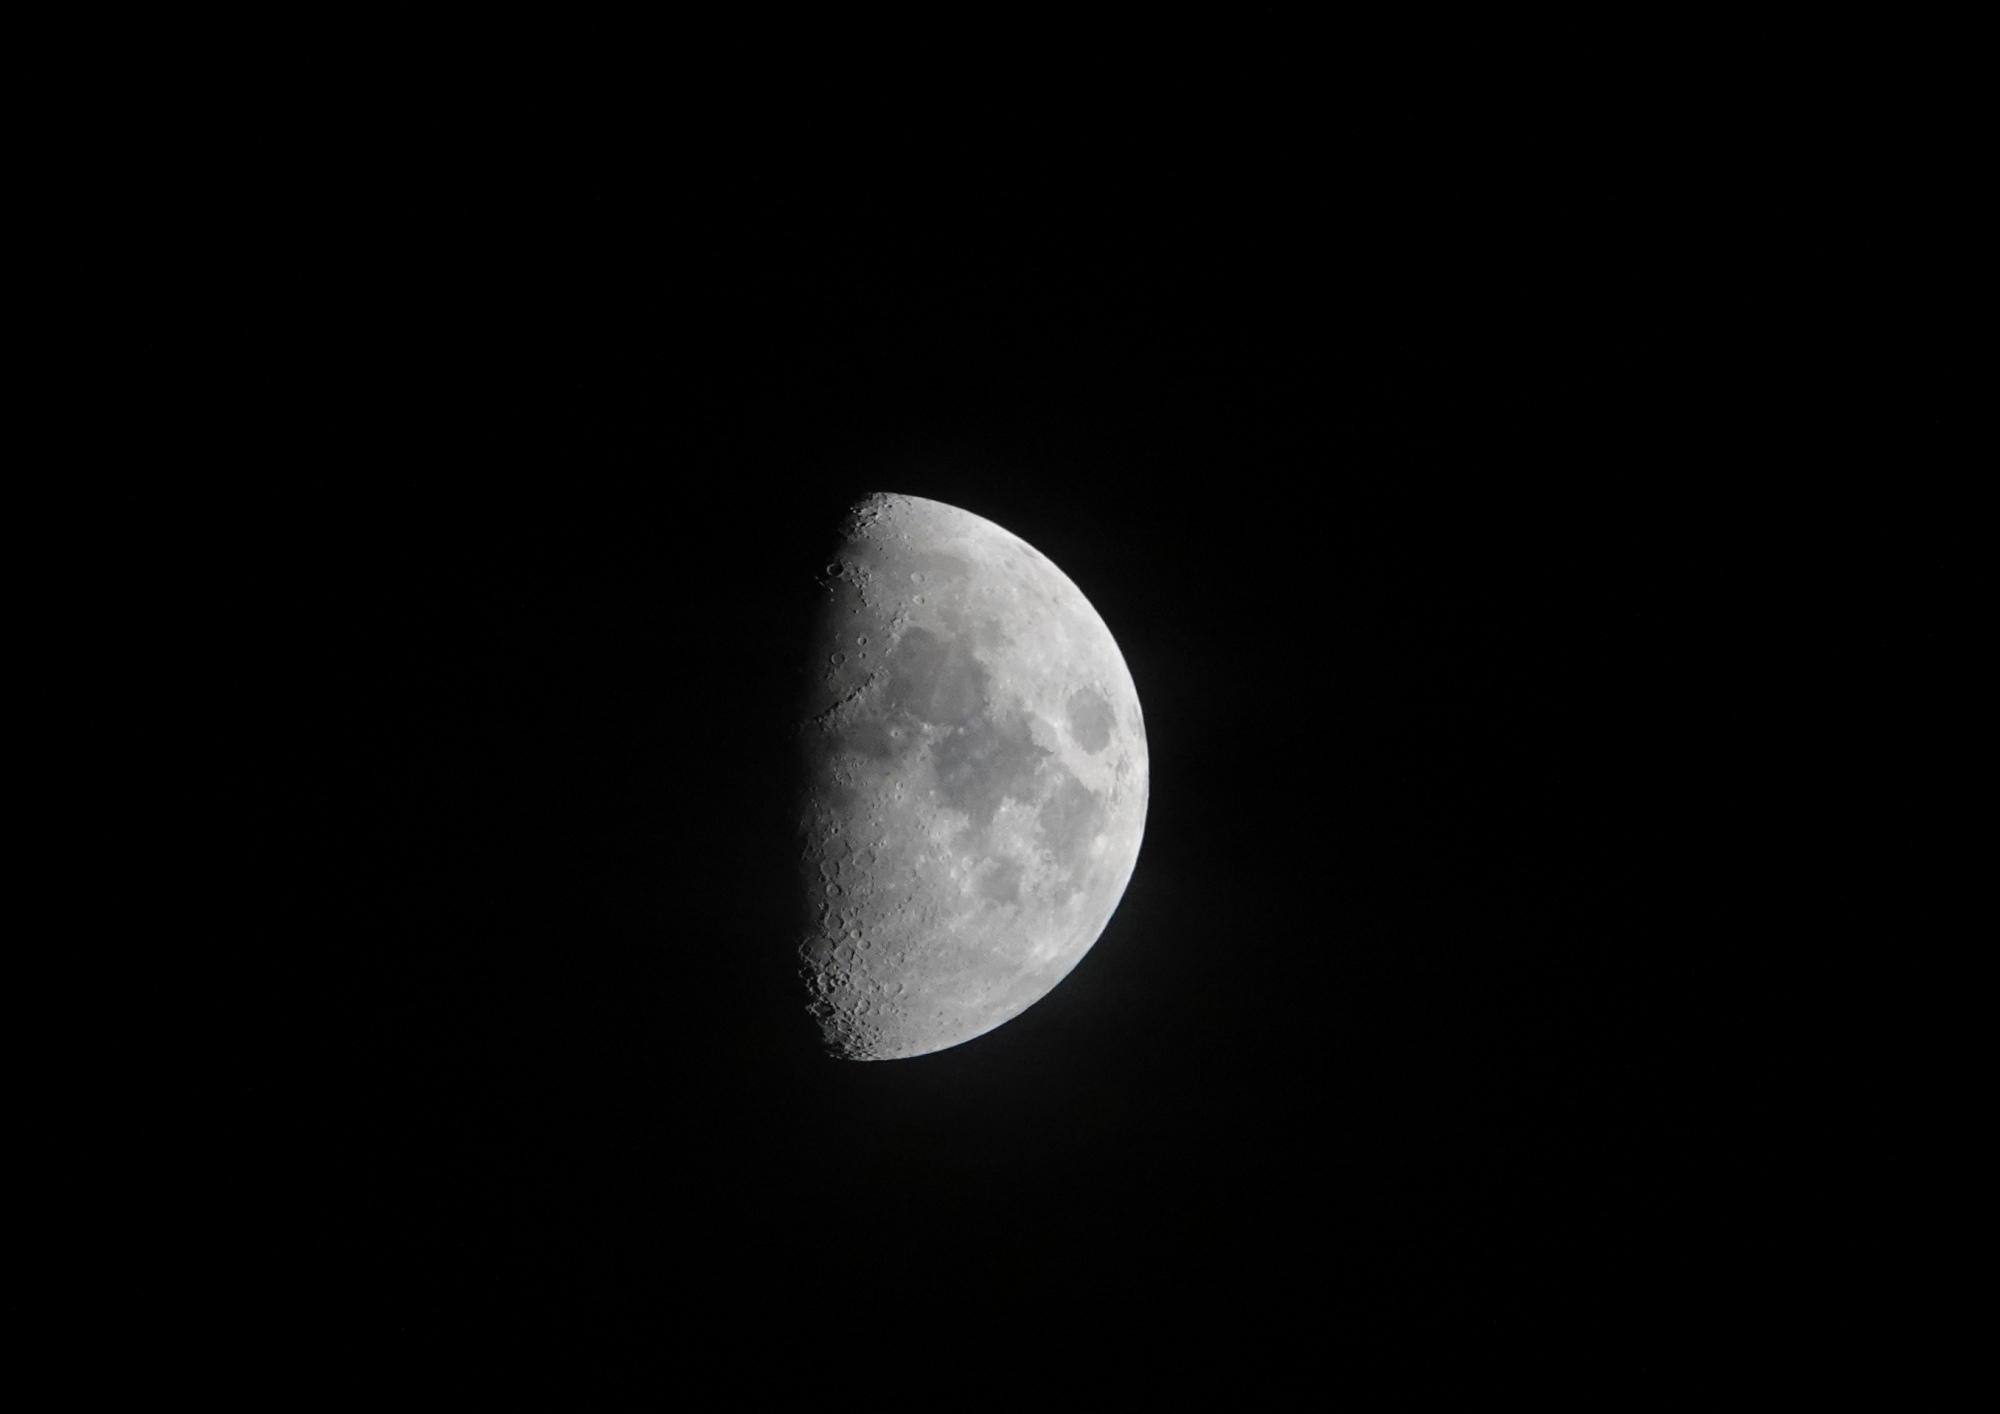 lune2.thumb.JPG.3db45890c17c052664a6ad5b9d6bb4c6.JPG